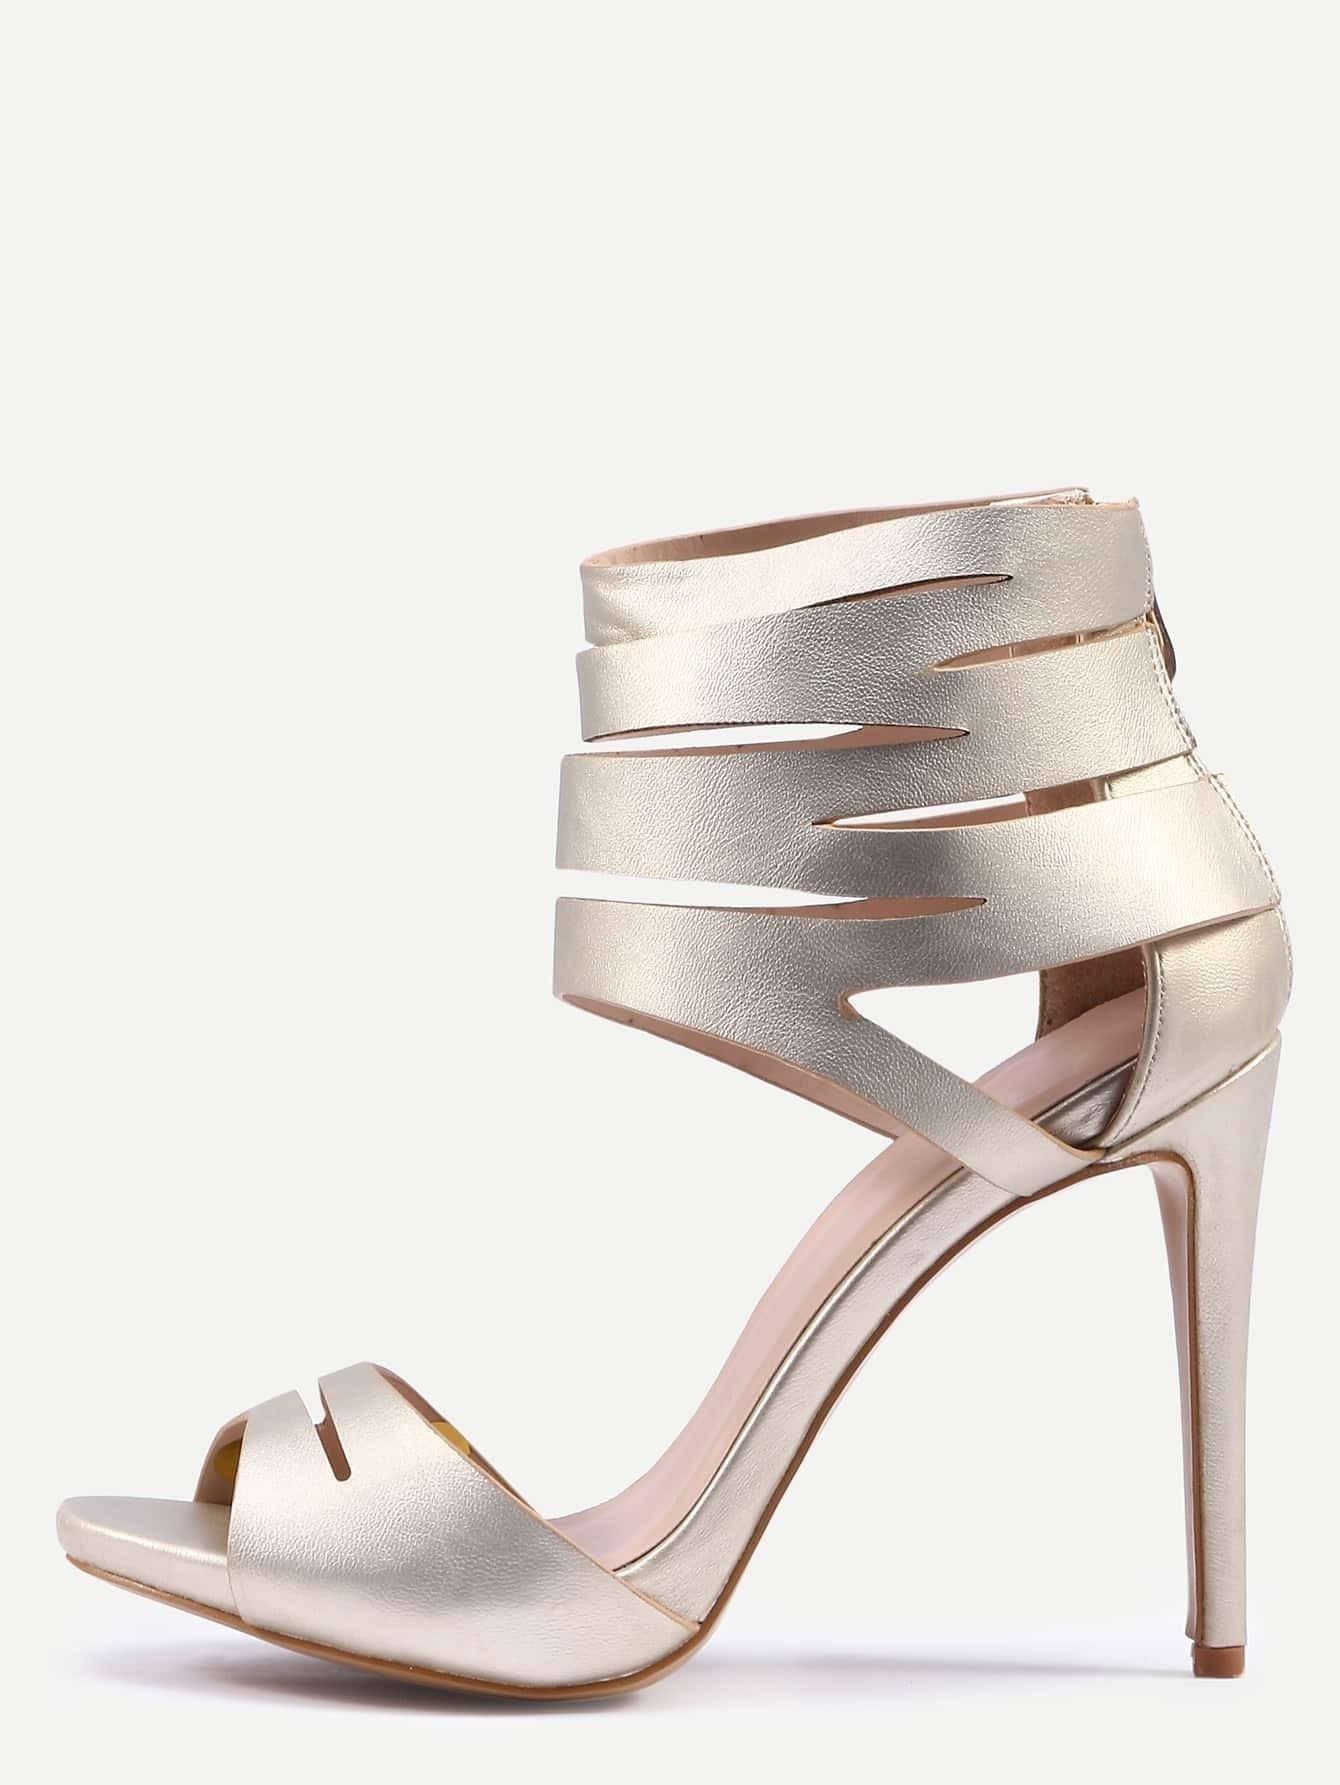 Fashion ankle cuff sandals